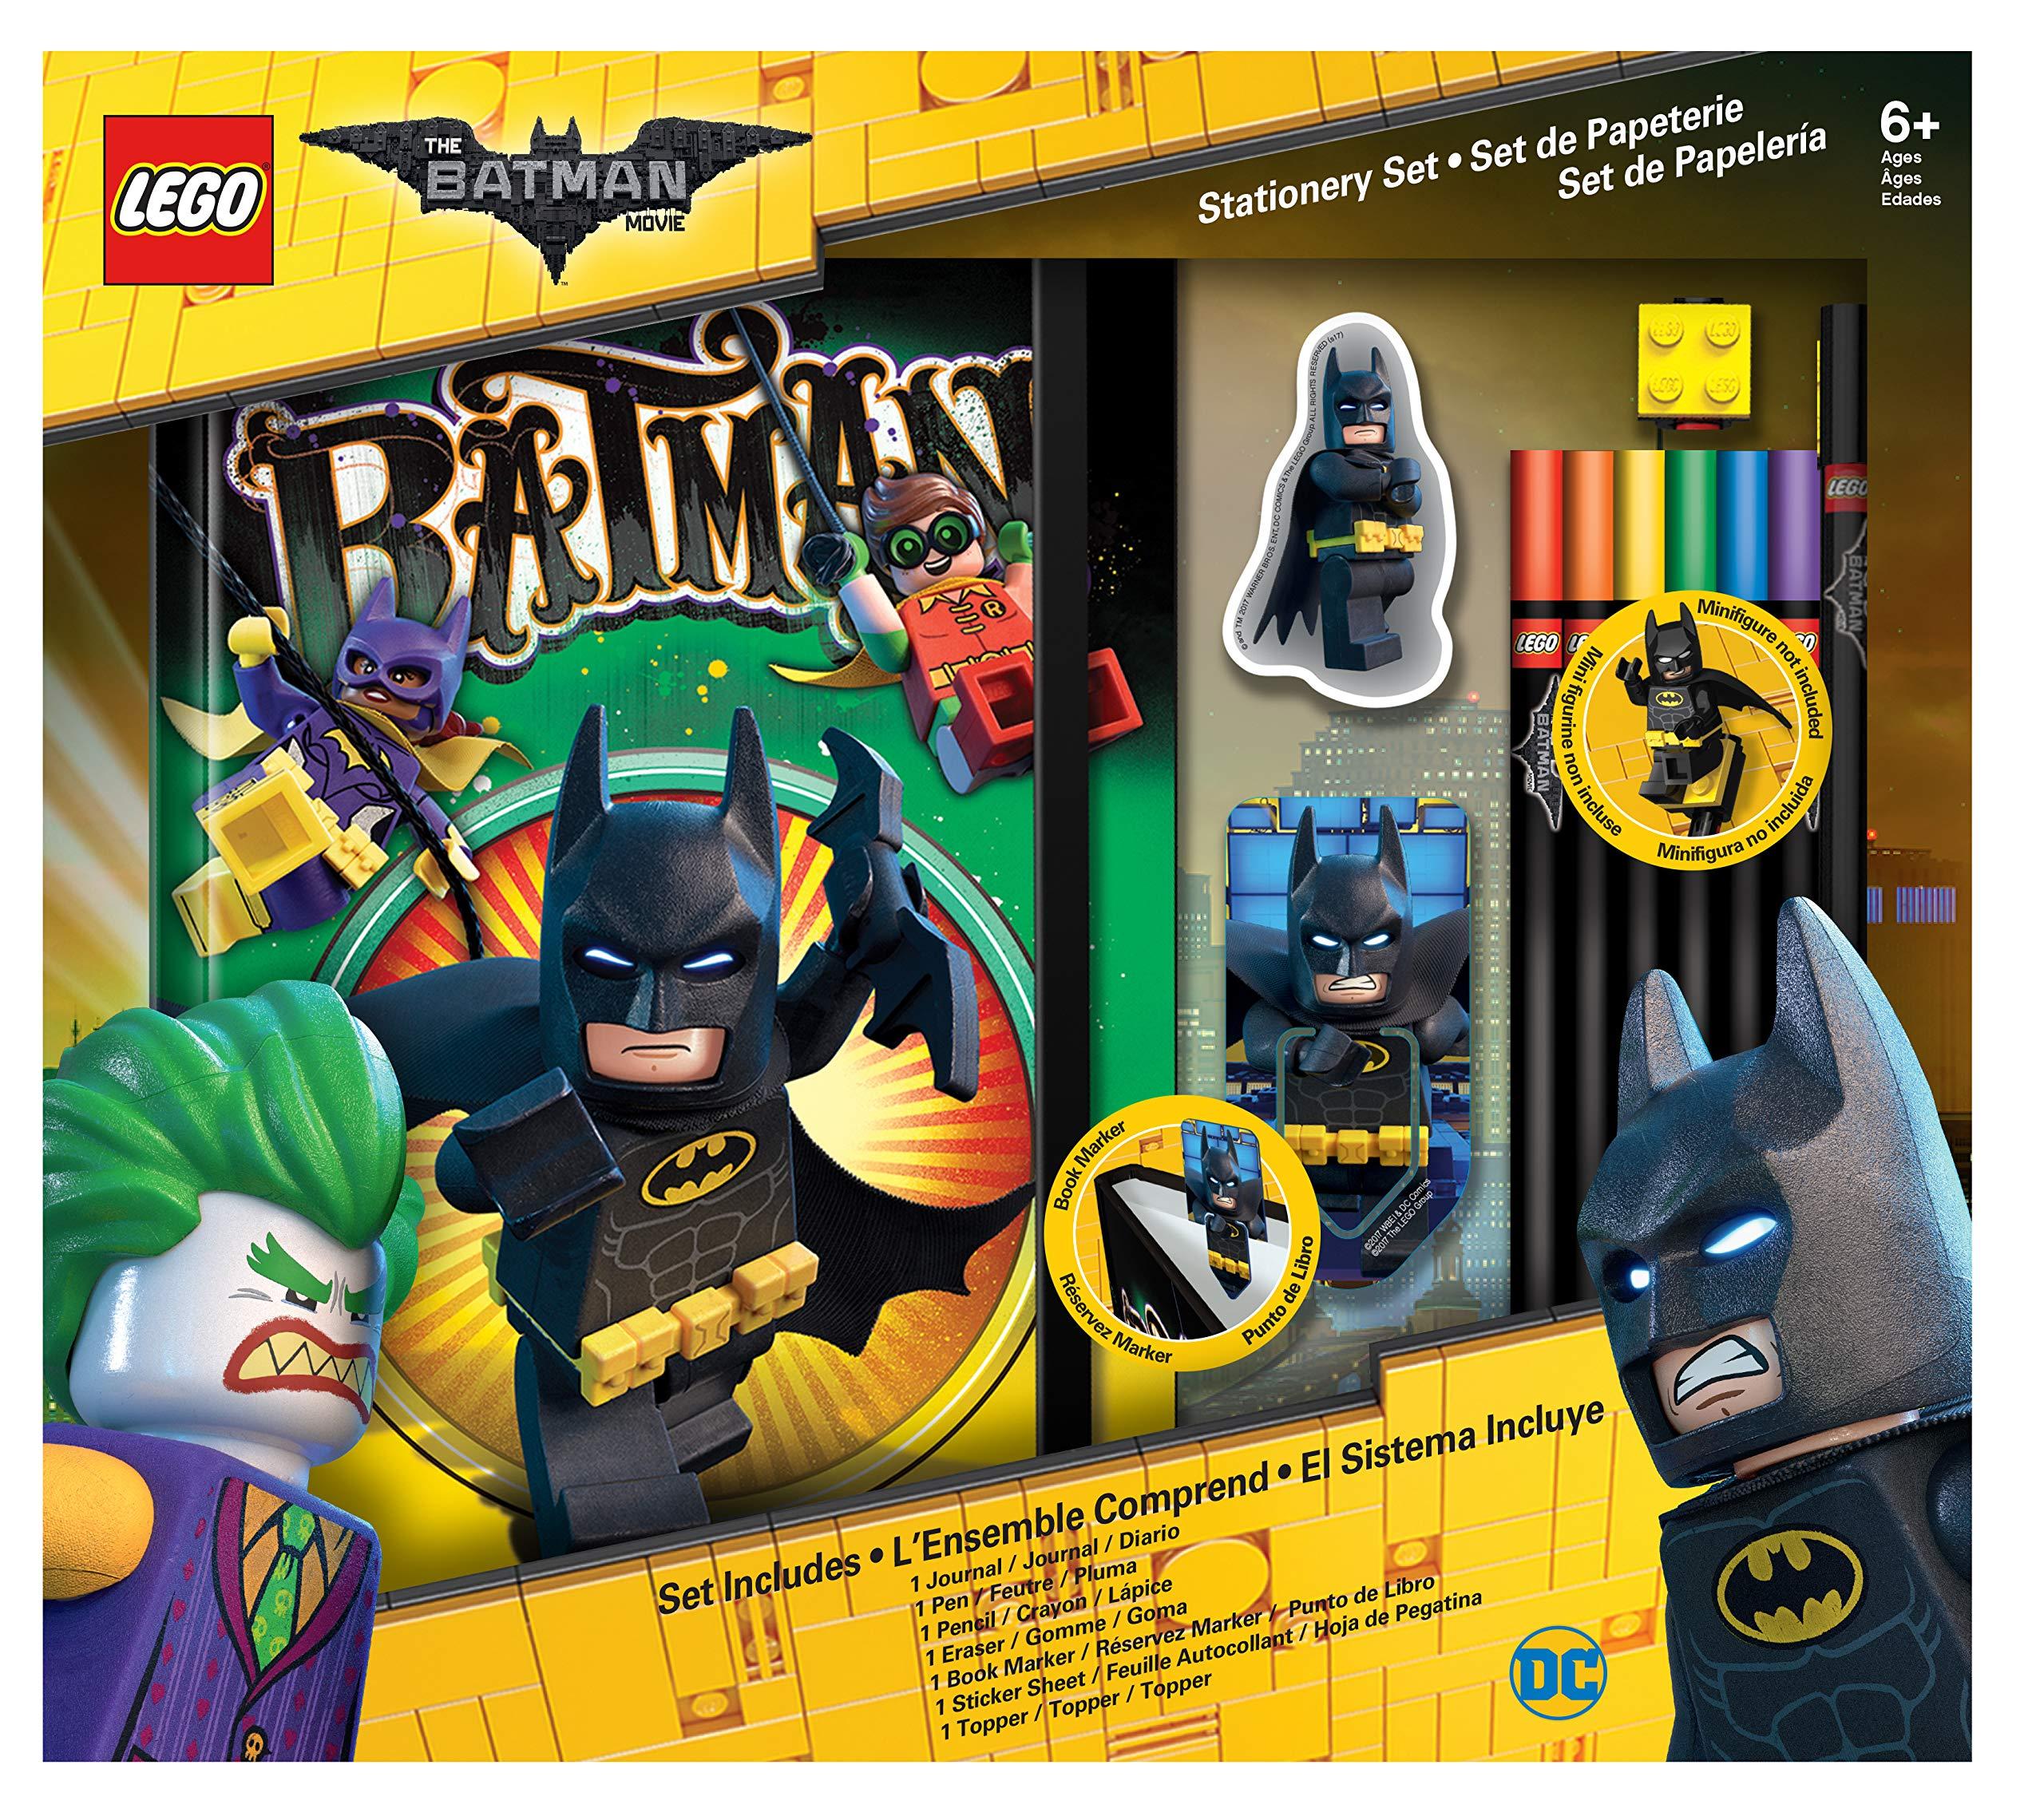 LEGO Batman Movie Journal and Stationery Set by LEGO